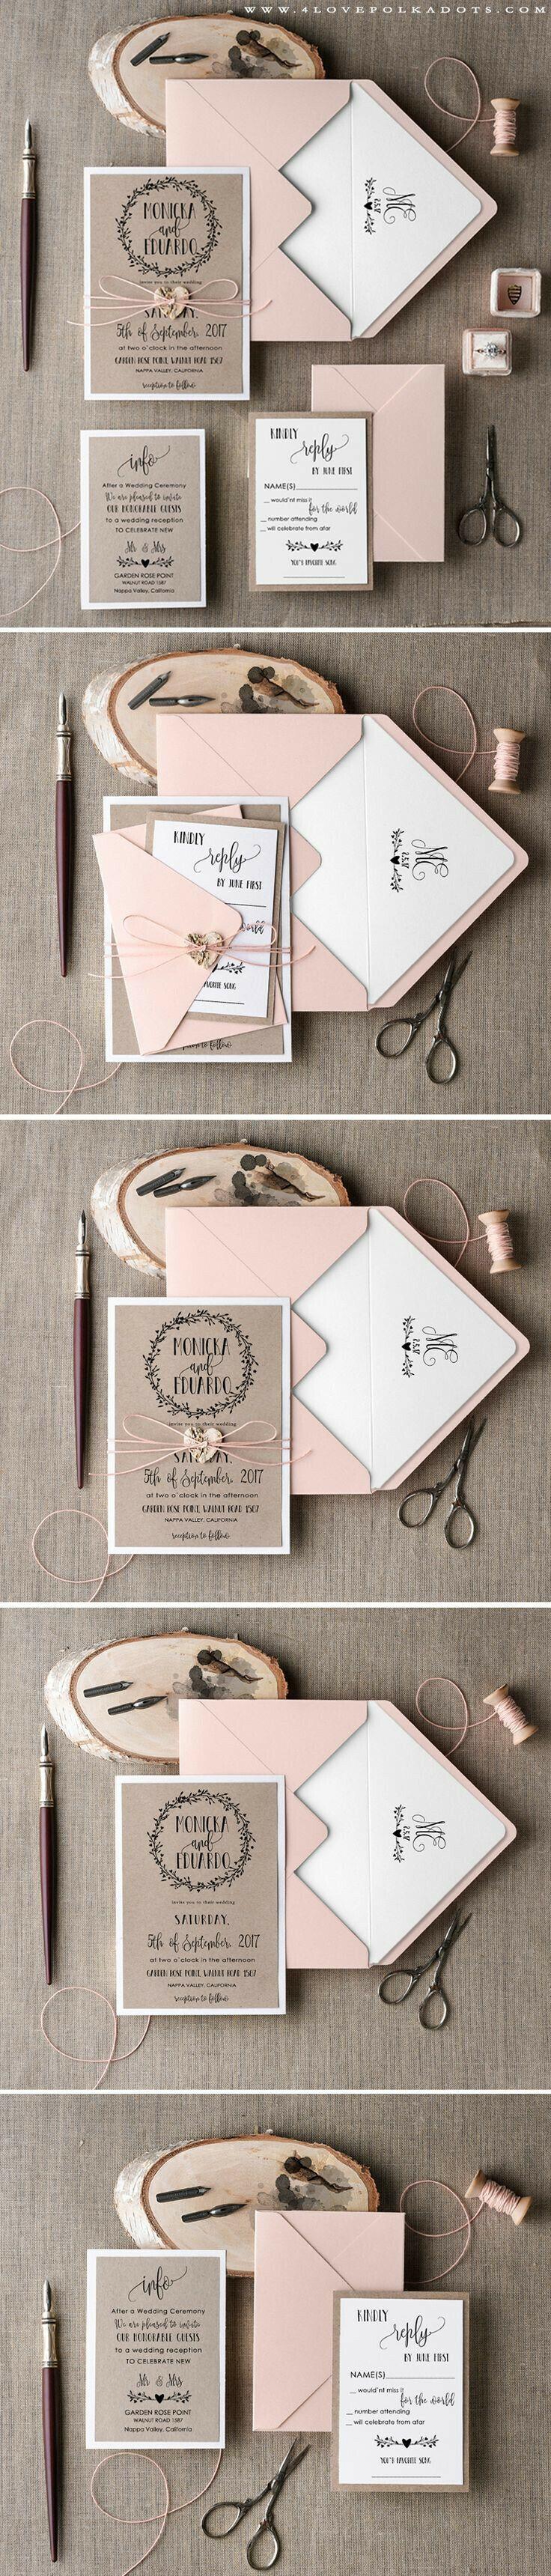 Wedding Stationary | Invitations | Inspiration